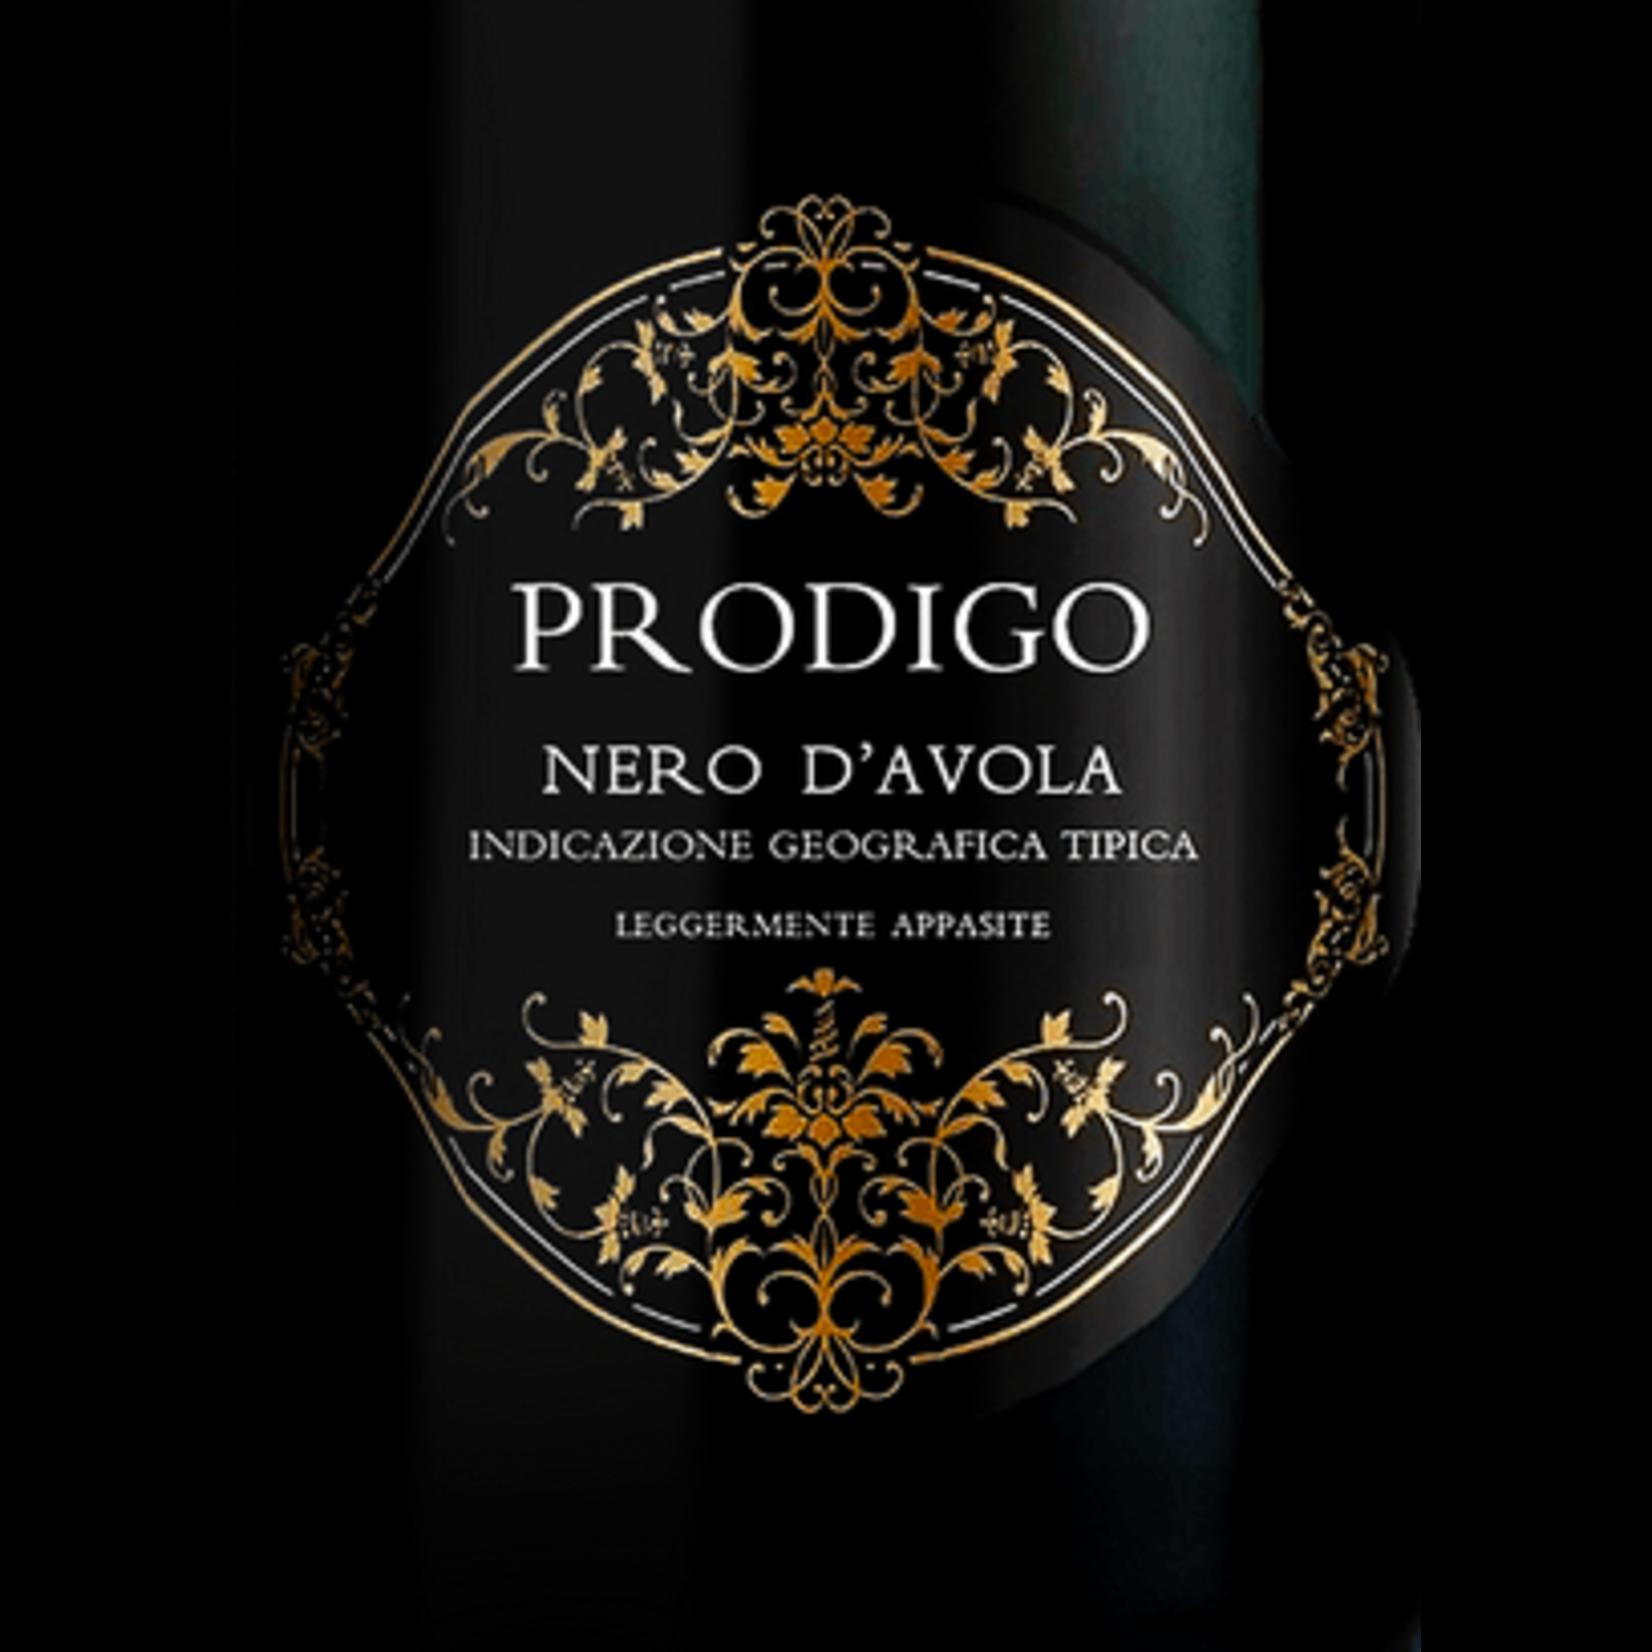 Prodigo Prodigo Nero D 'Avola 2020  Sicily, Italy